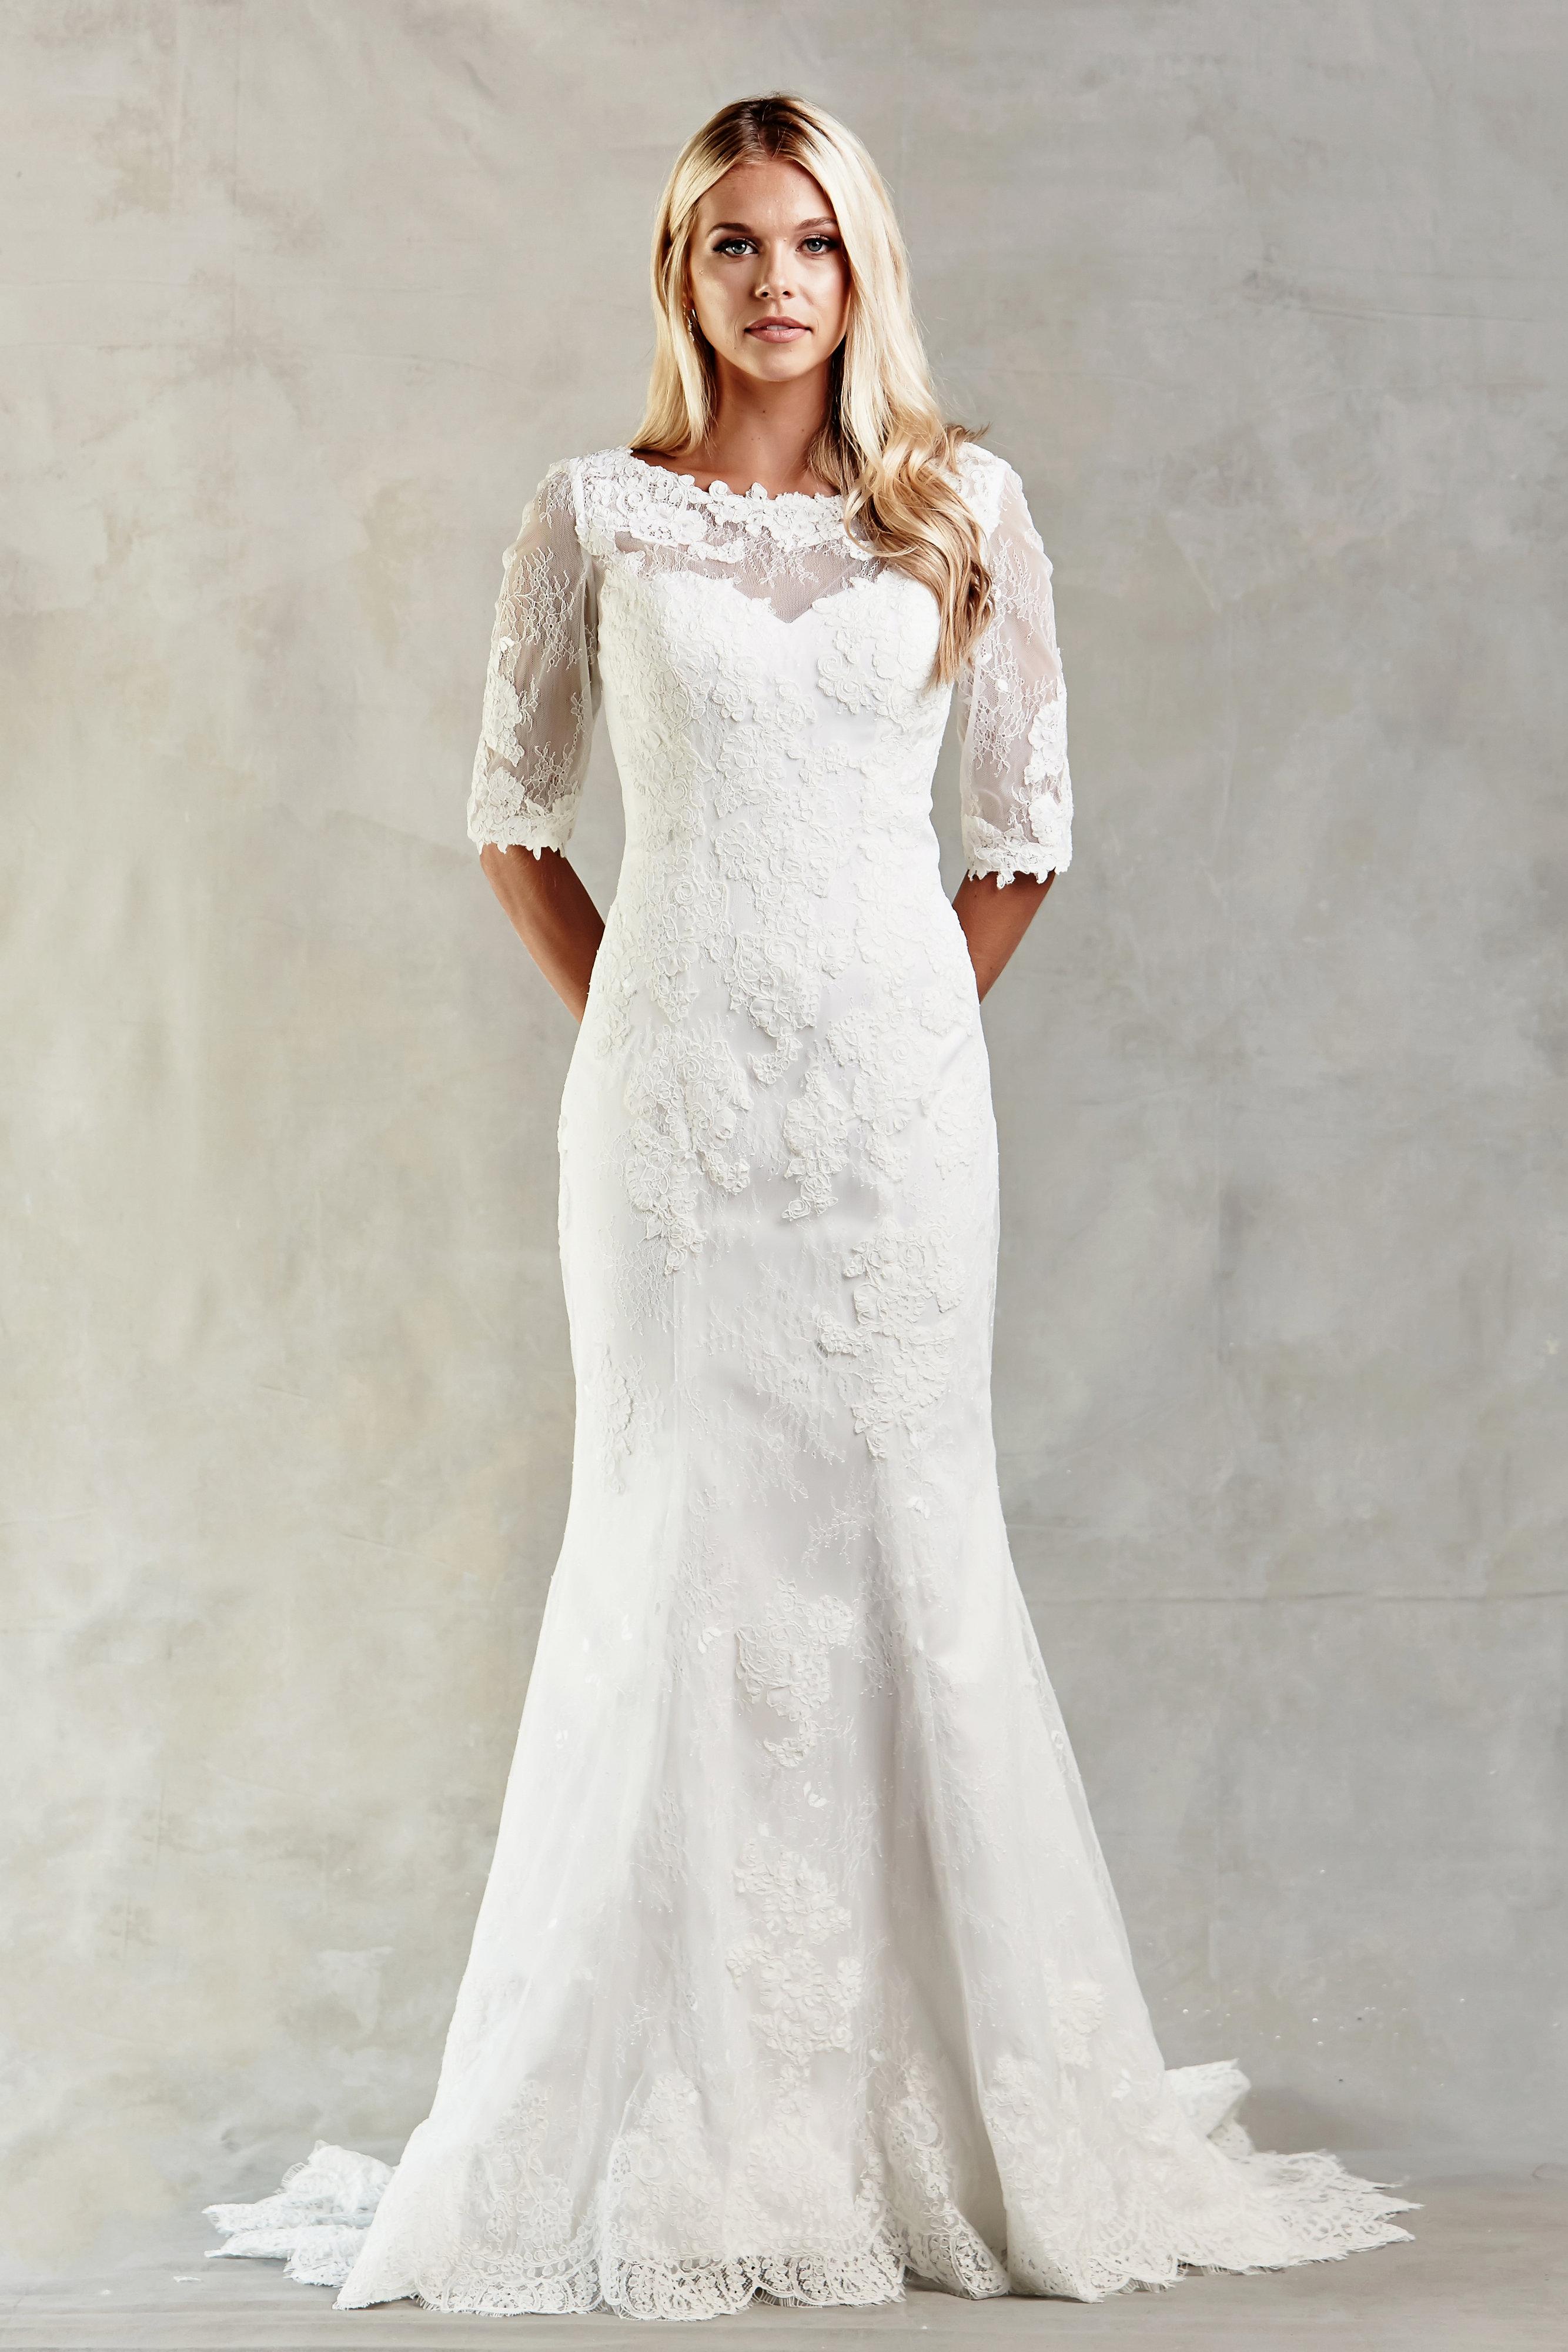 Boho weddings dress style atlanta macon weddings for Wedding dresses macon ga